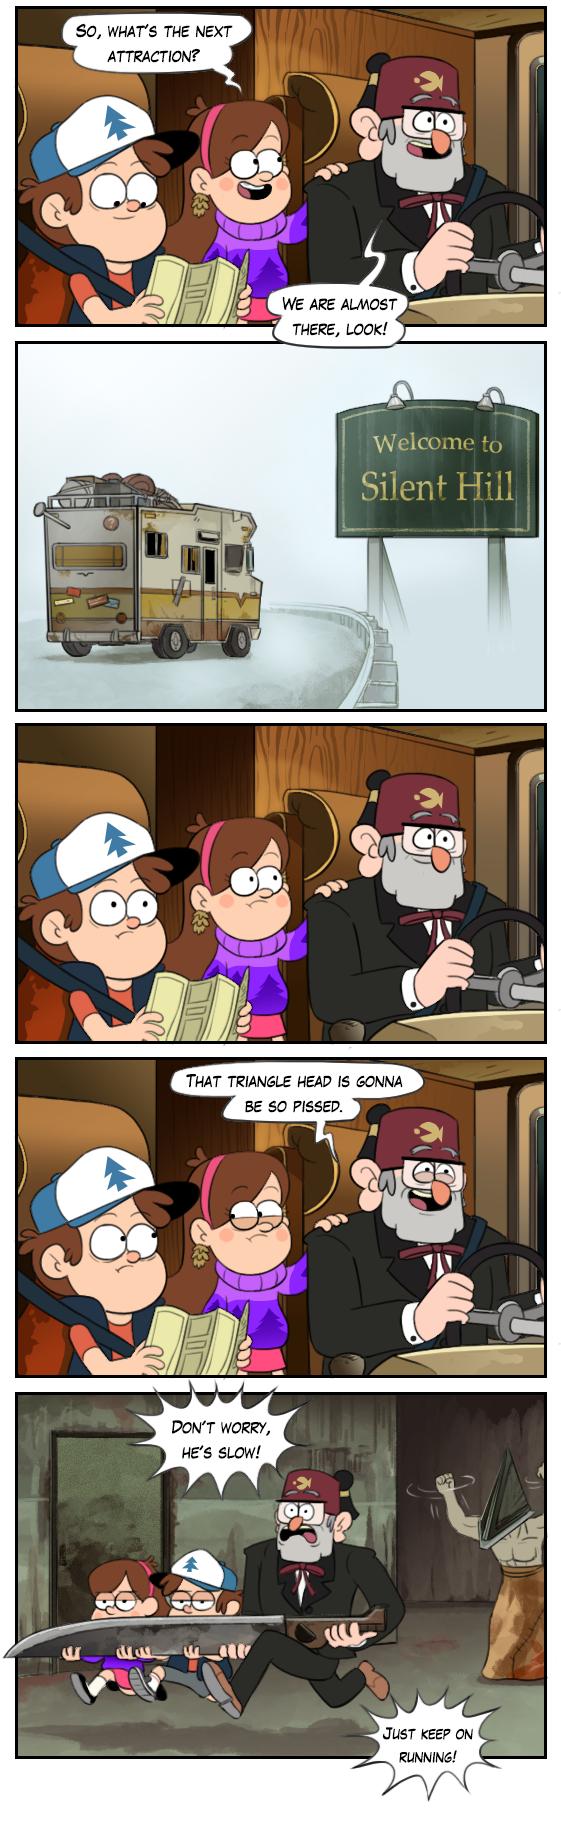 Revenge trip by markmak